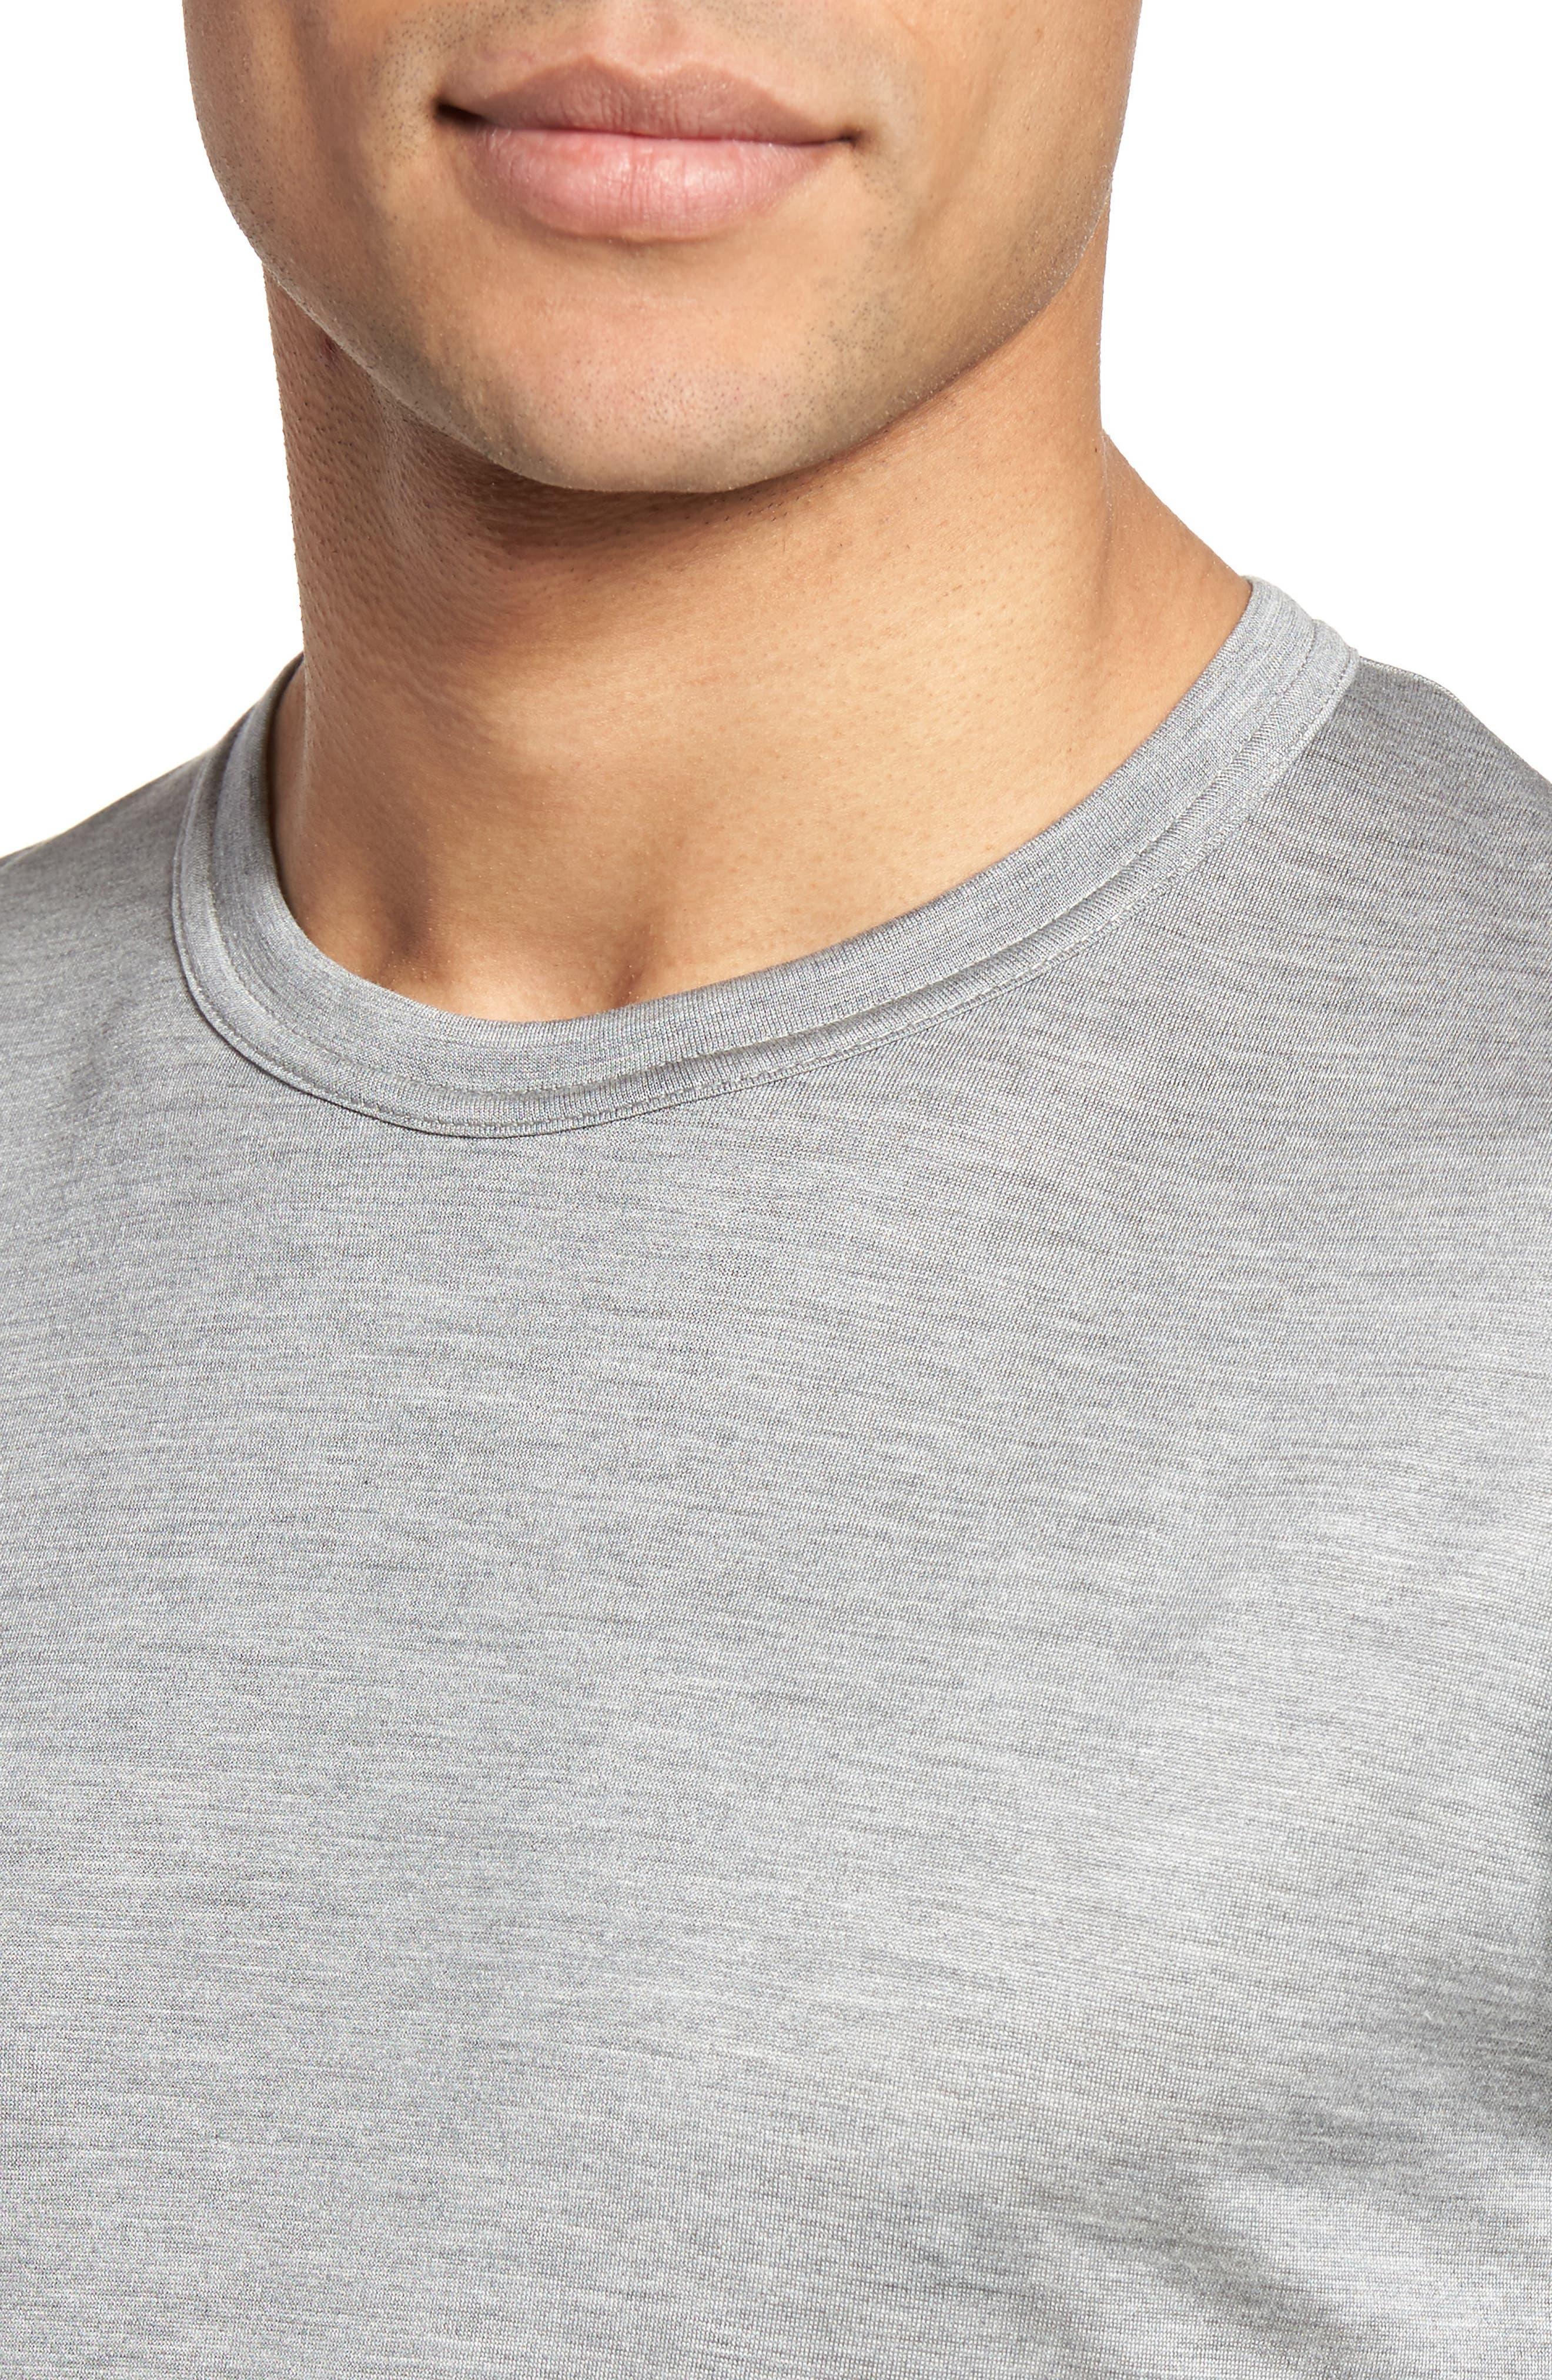 Colorblock Silk & Cotton T-Shirt,                             Alternate thumbnail 4, color,                             Light Grey/ Dark Grey